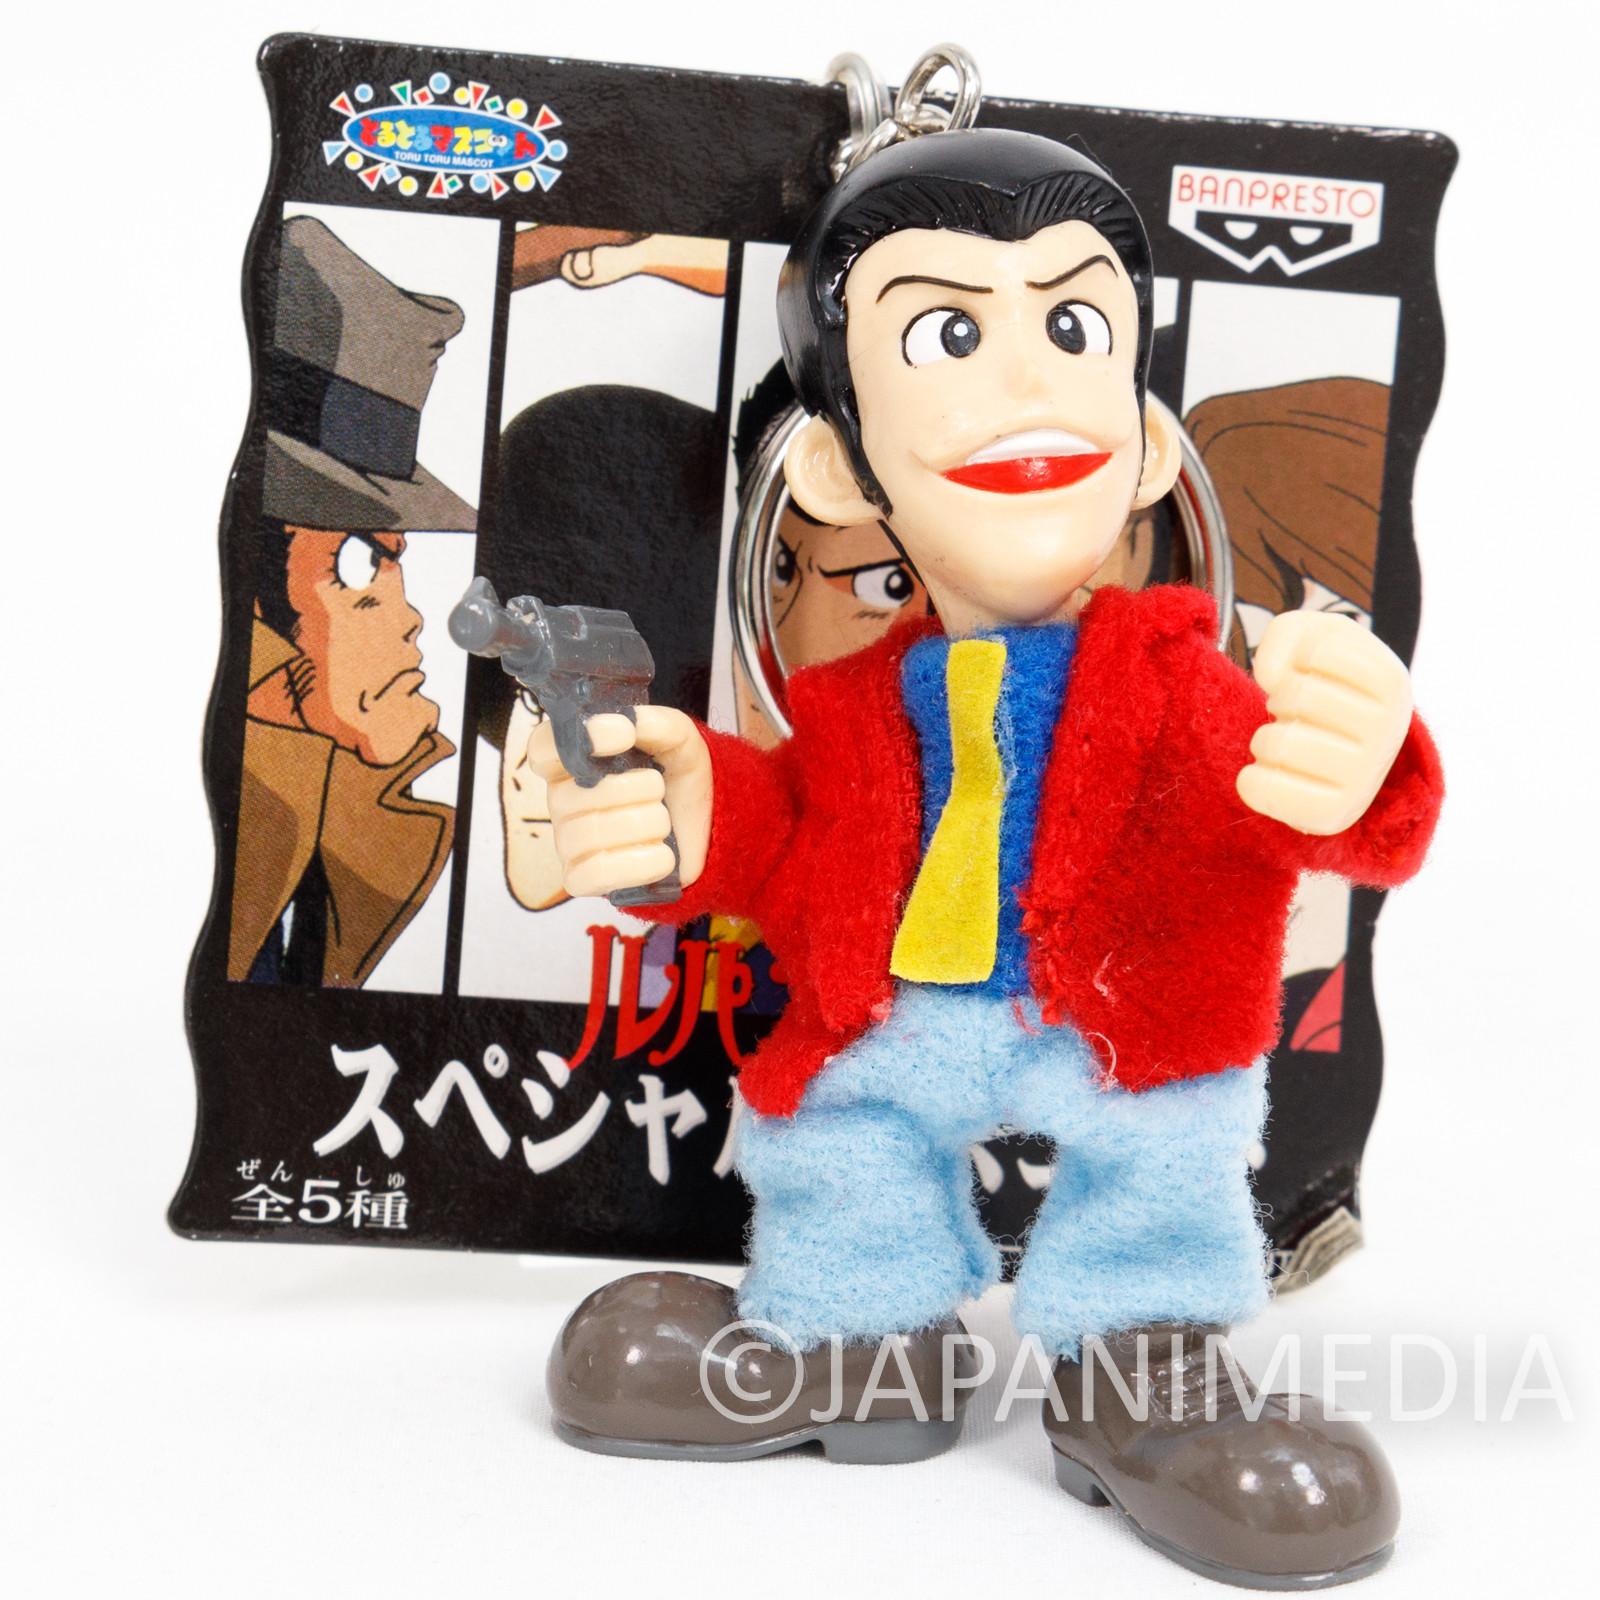 Lupin the Third (3rd) LUPIN Figure Doll Keychain Banpresto JAPAN ANIME